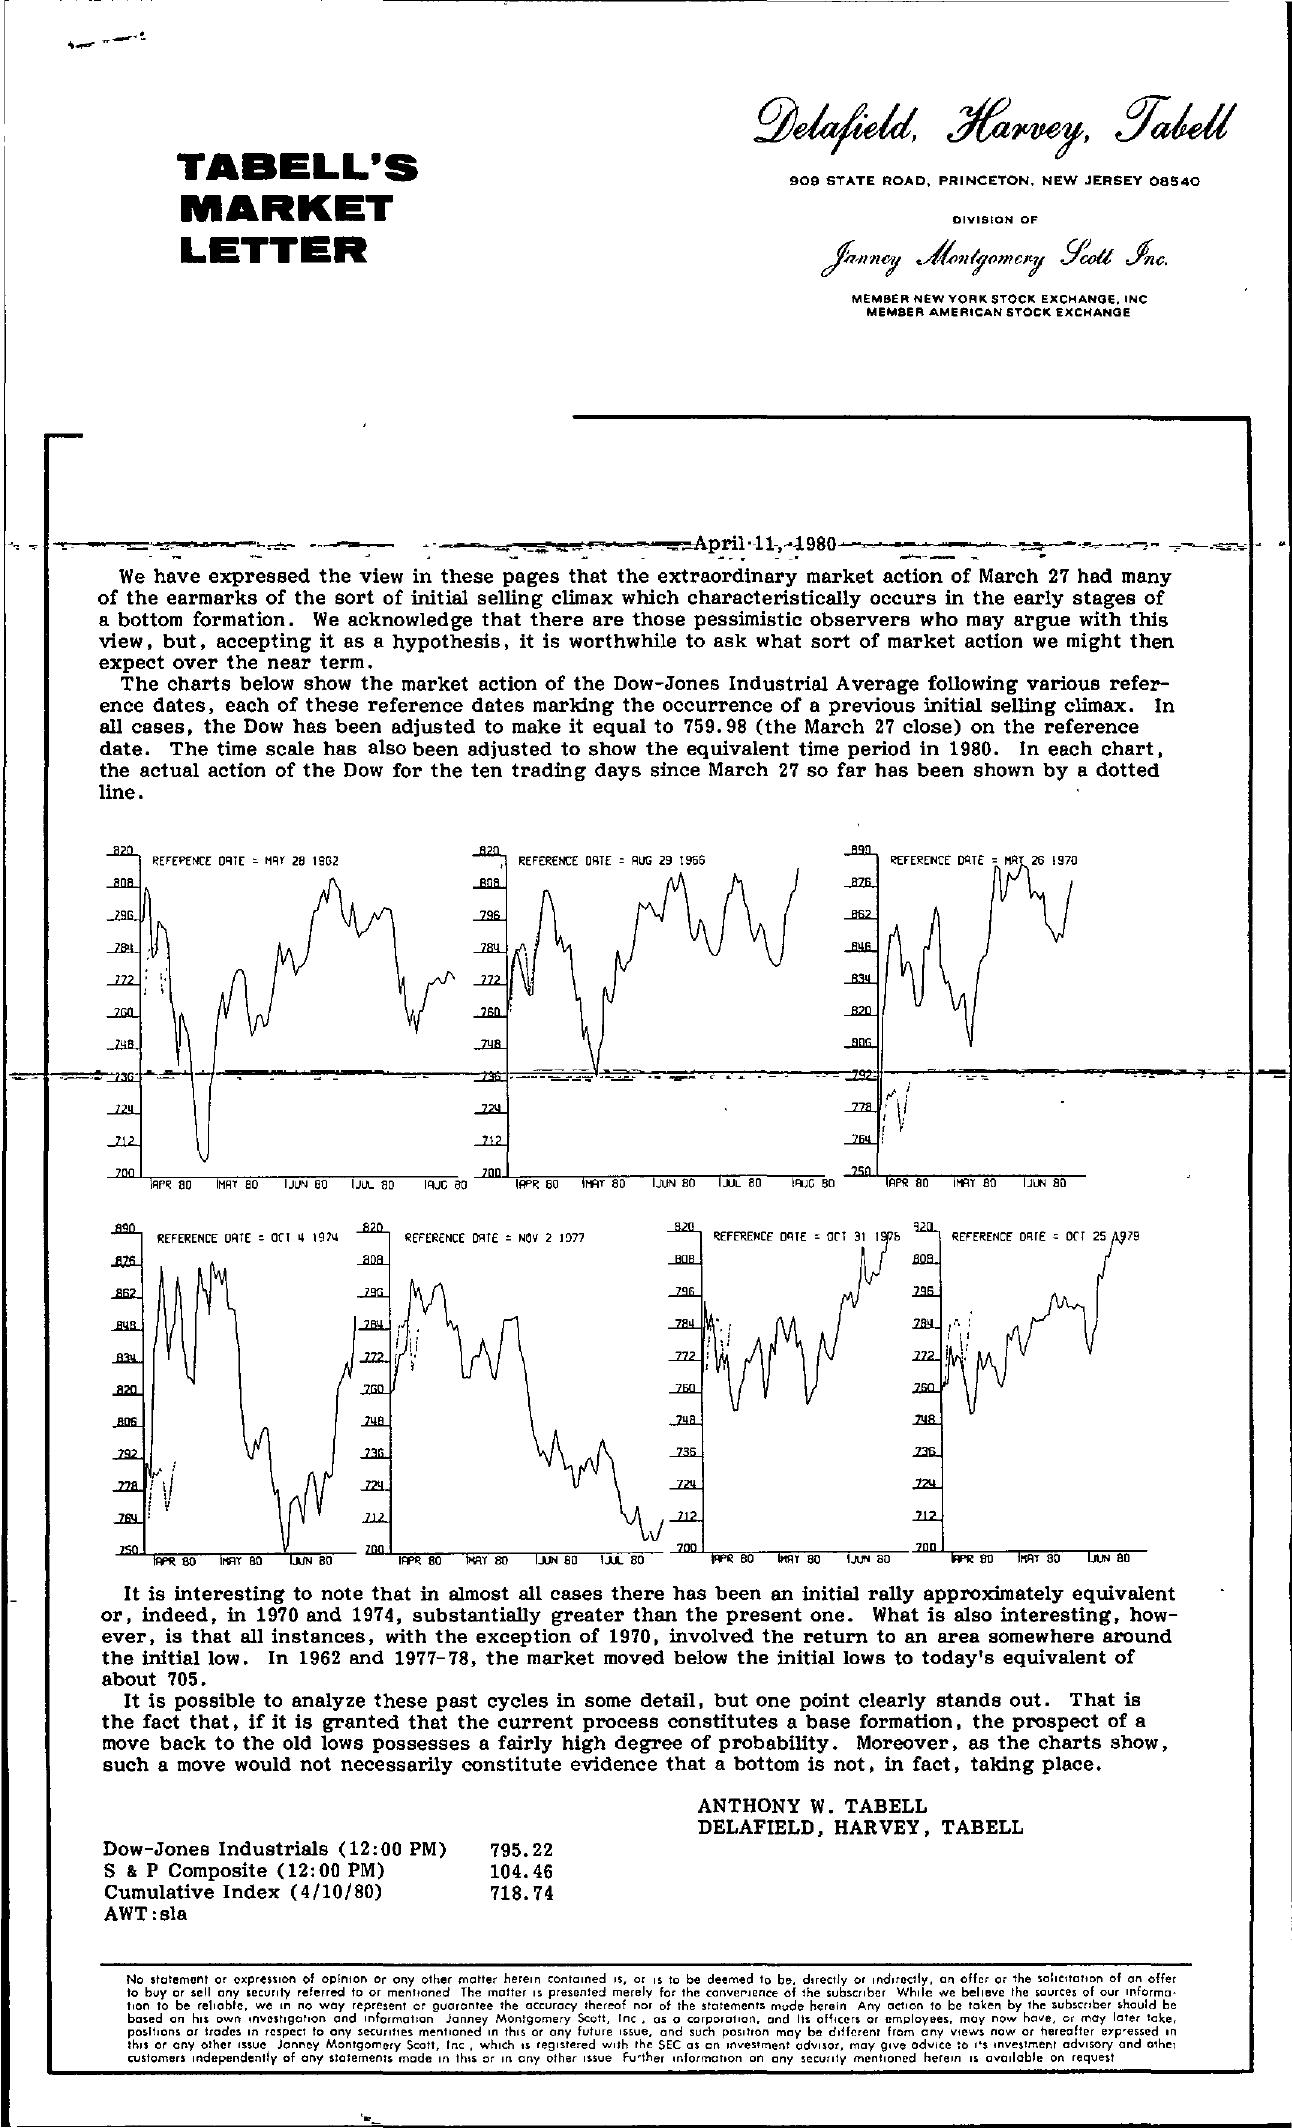 Tabell's Market Letter - April 11, 1980